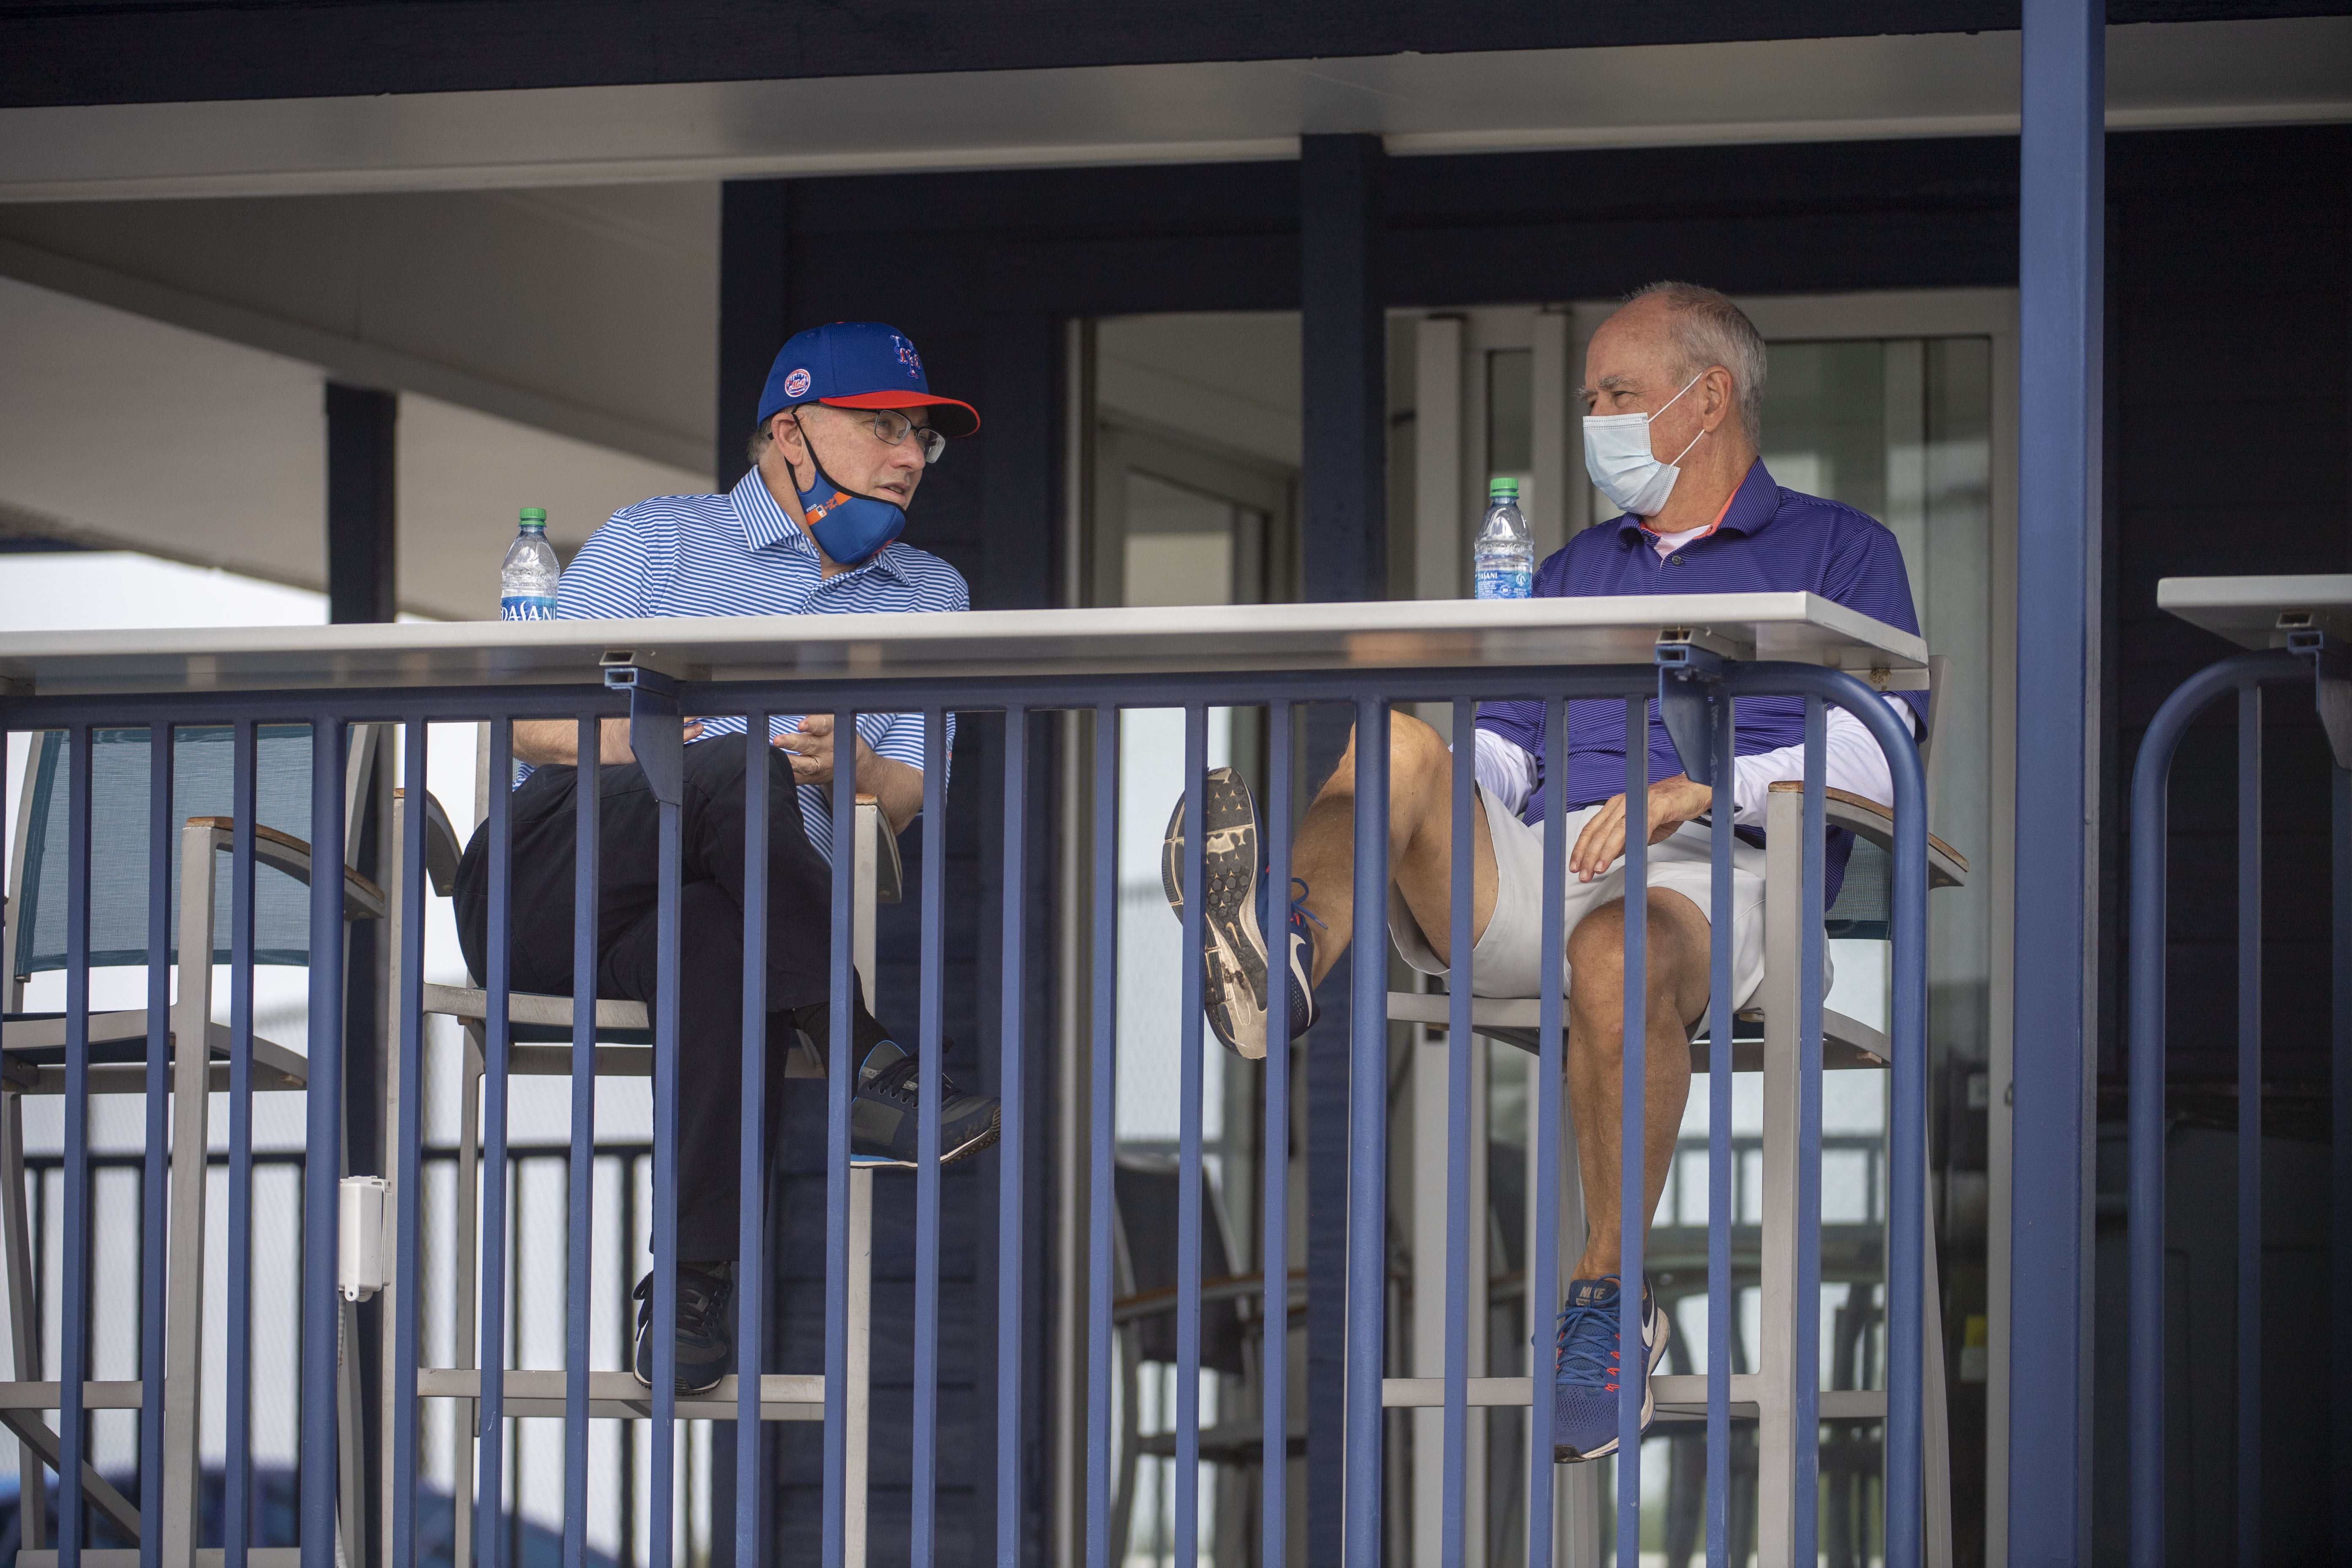 NY Mets owner Steve Cohen and manager Sandy Alderson